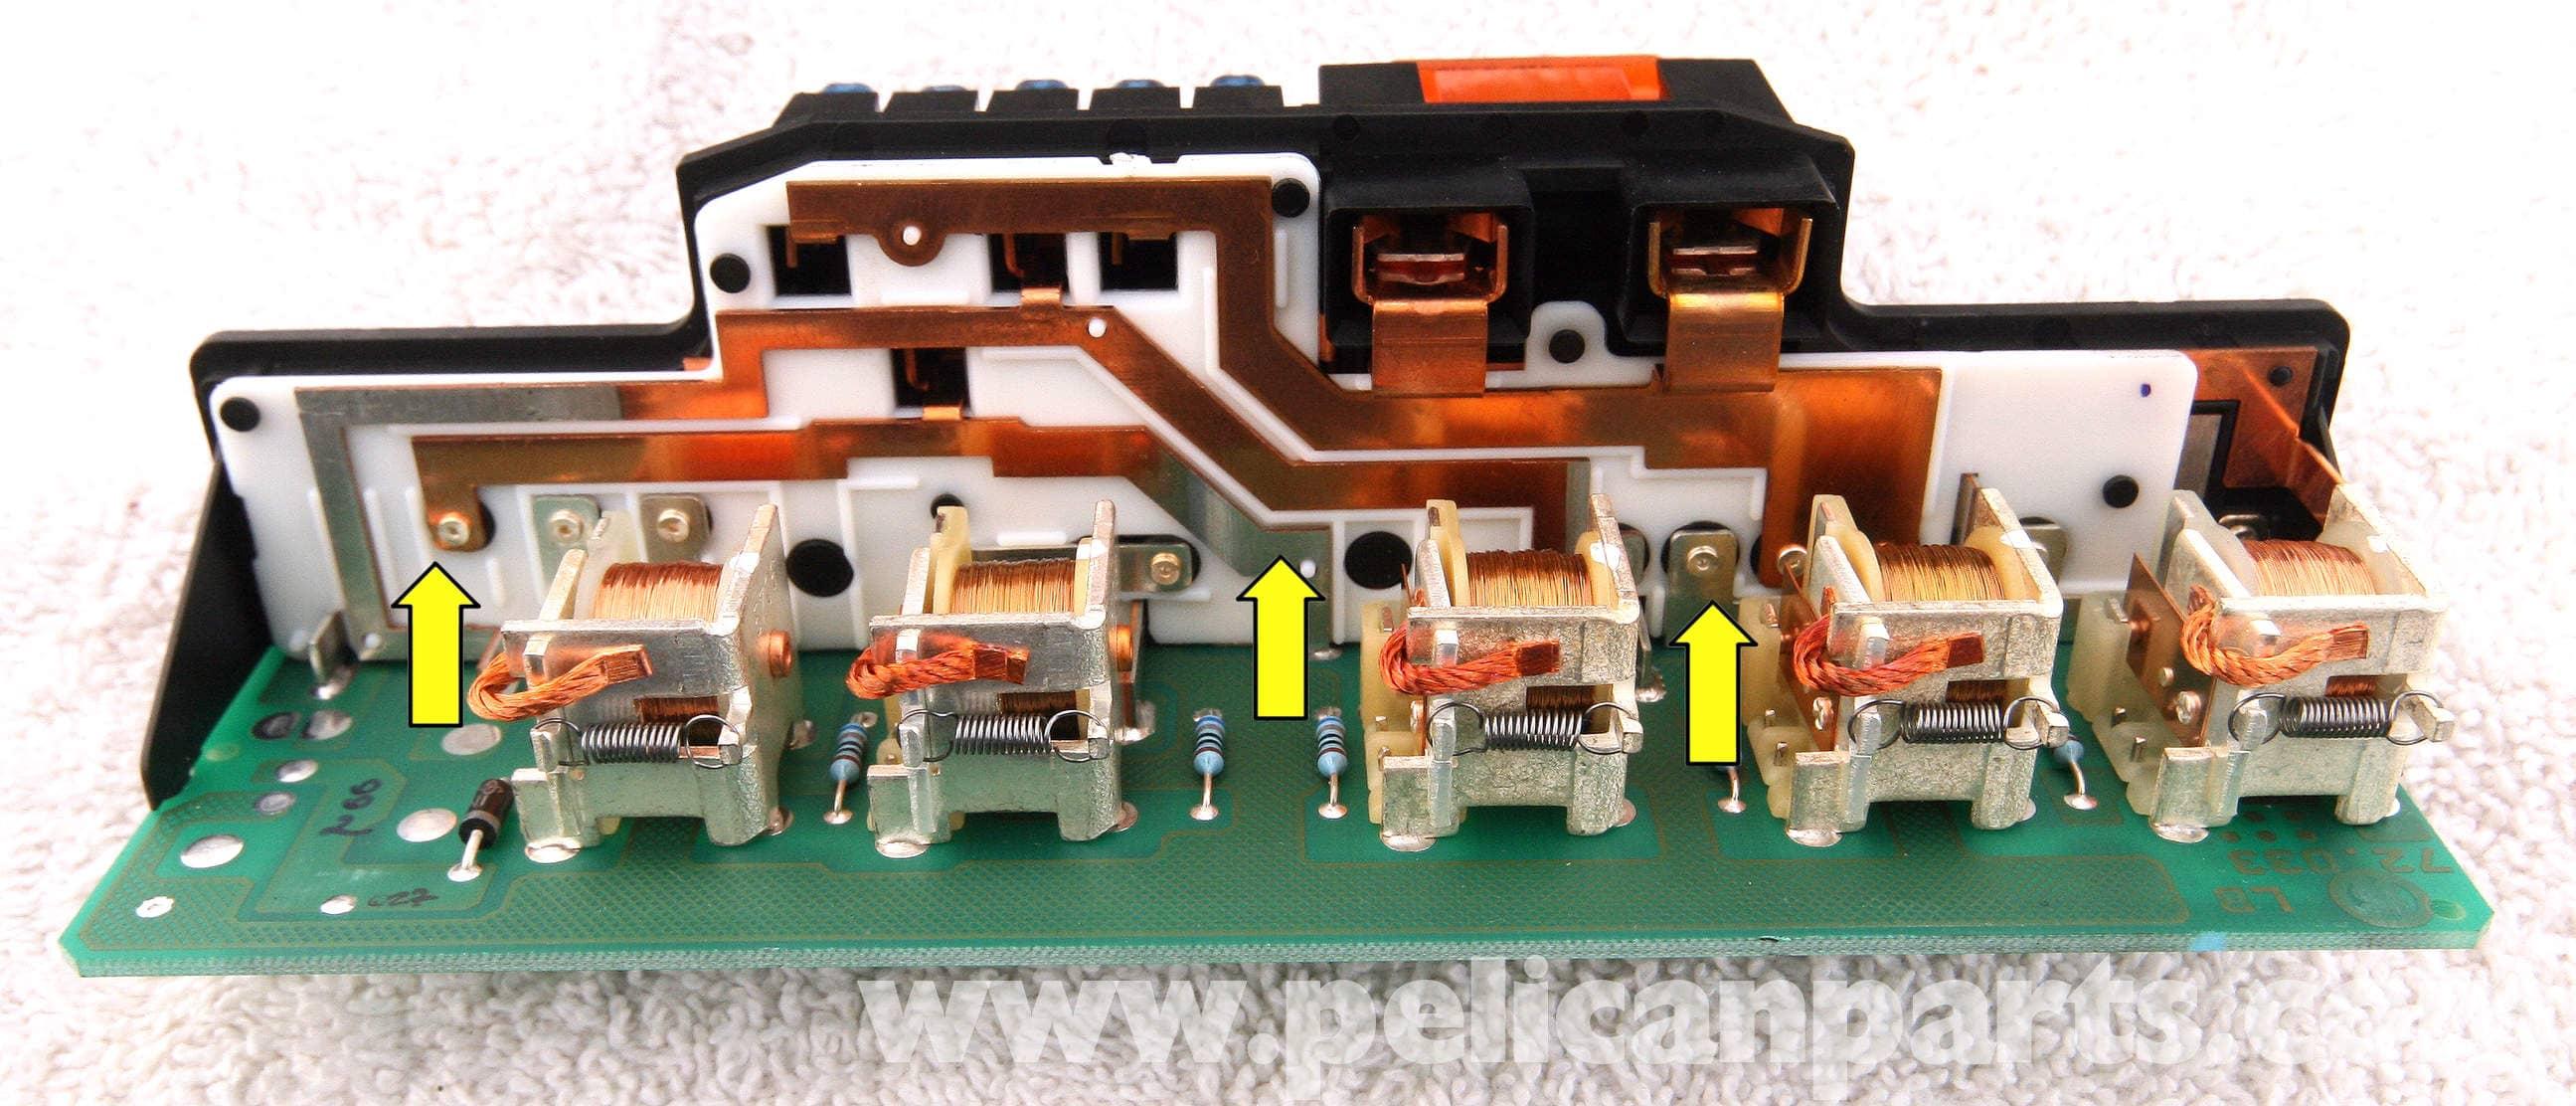 Mercedes-Benz SLK 230 K40 Overload Protection Relay Repair | 1998